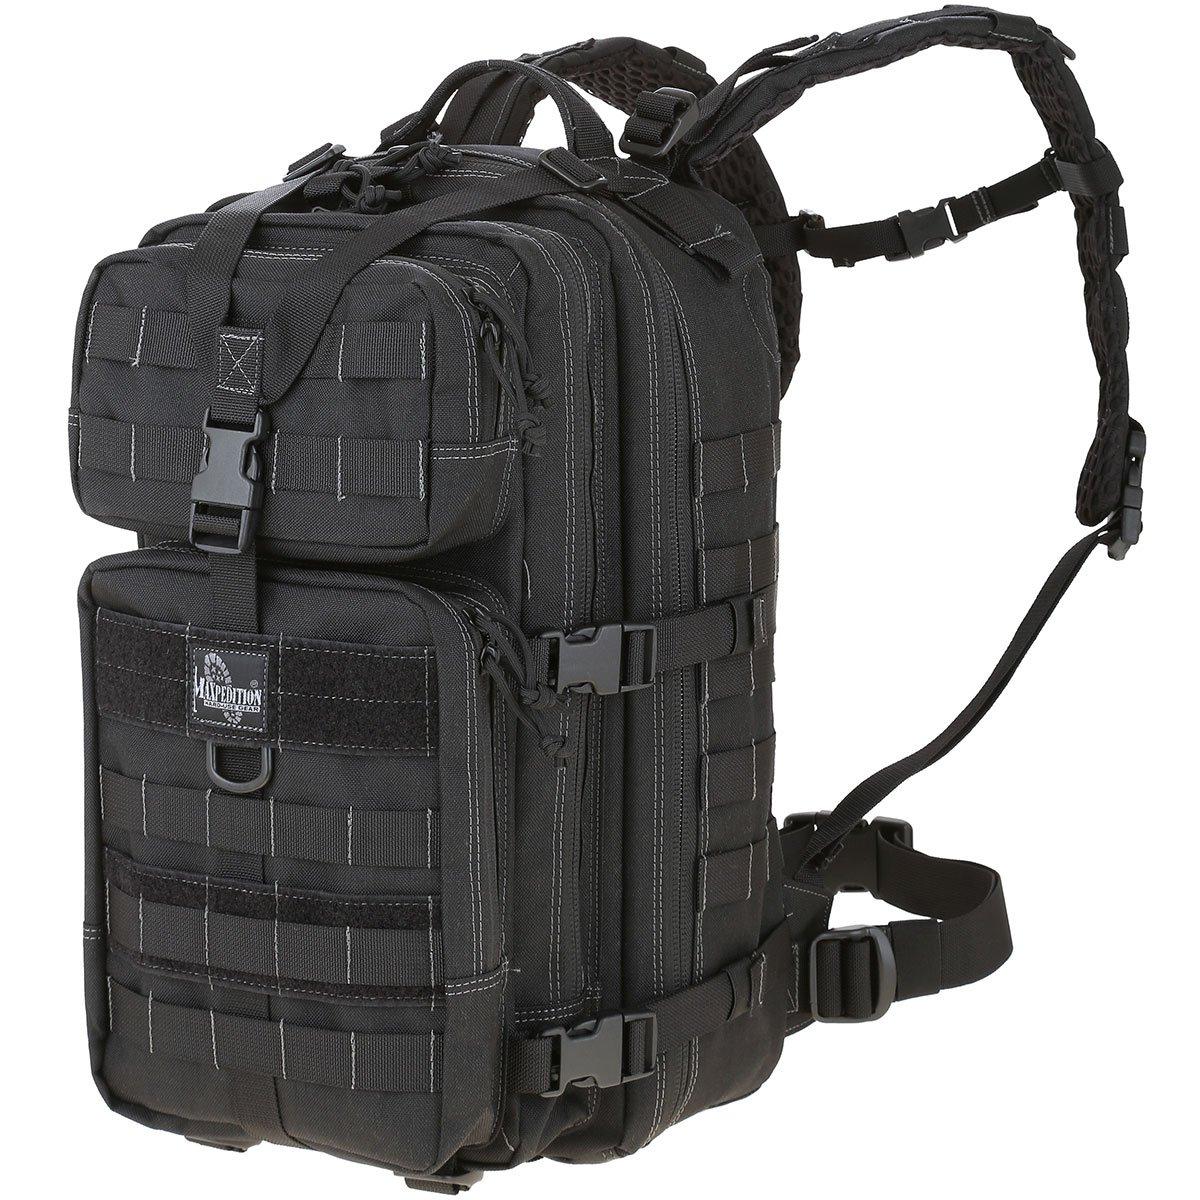 MXPT1430B-BRK Falcon-III Backpack black